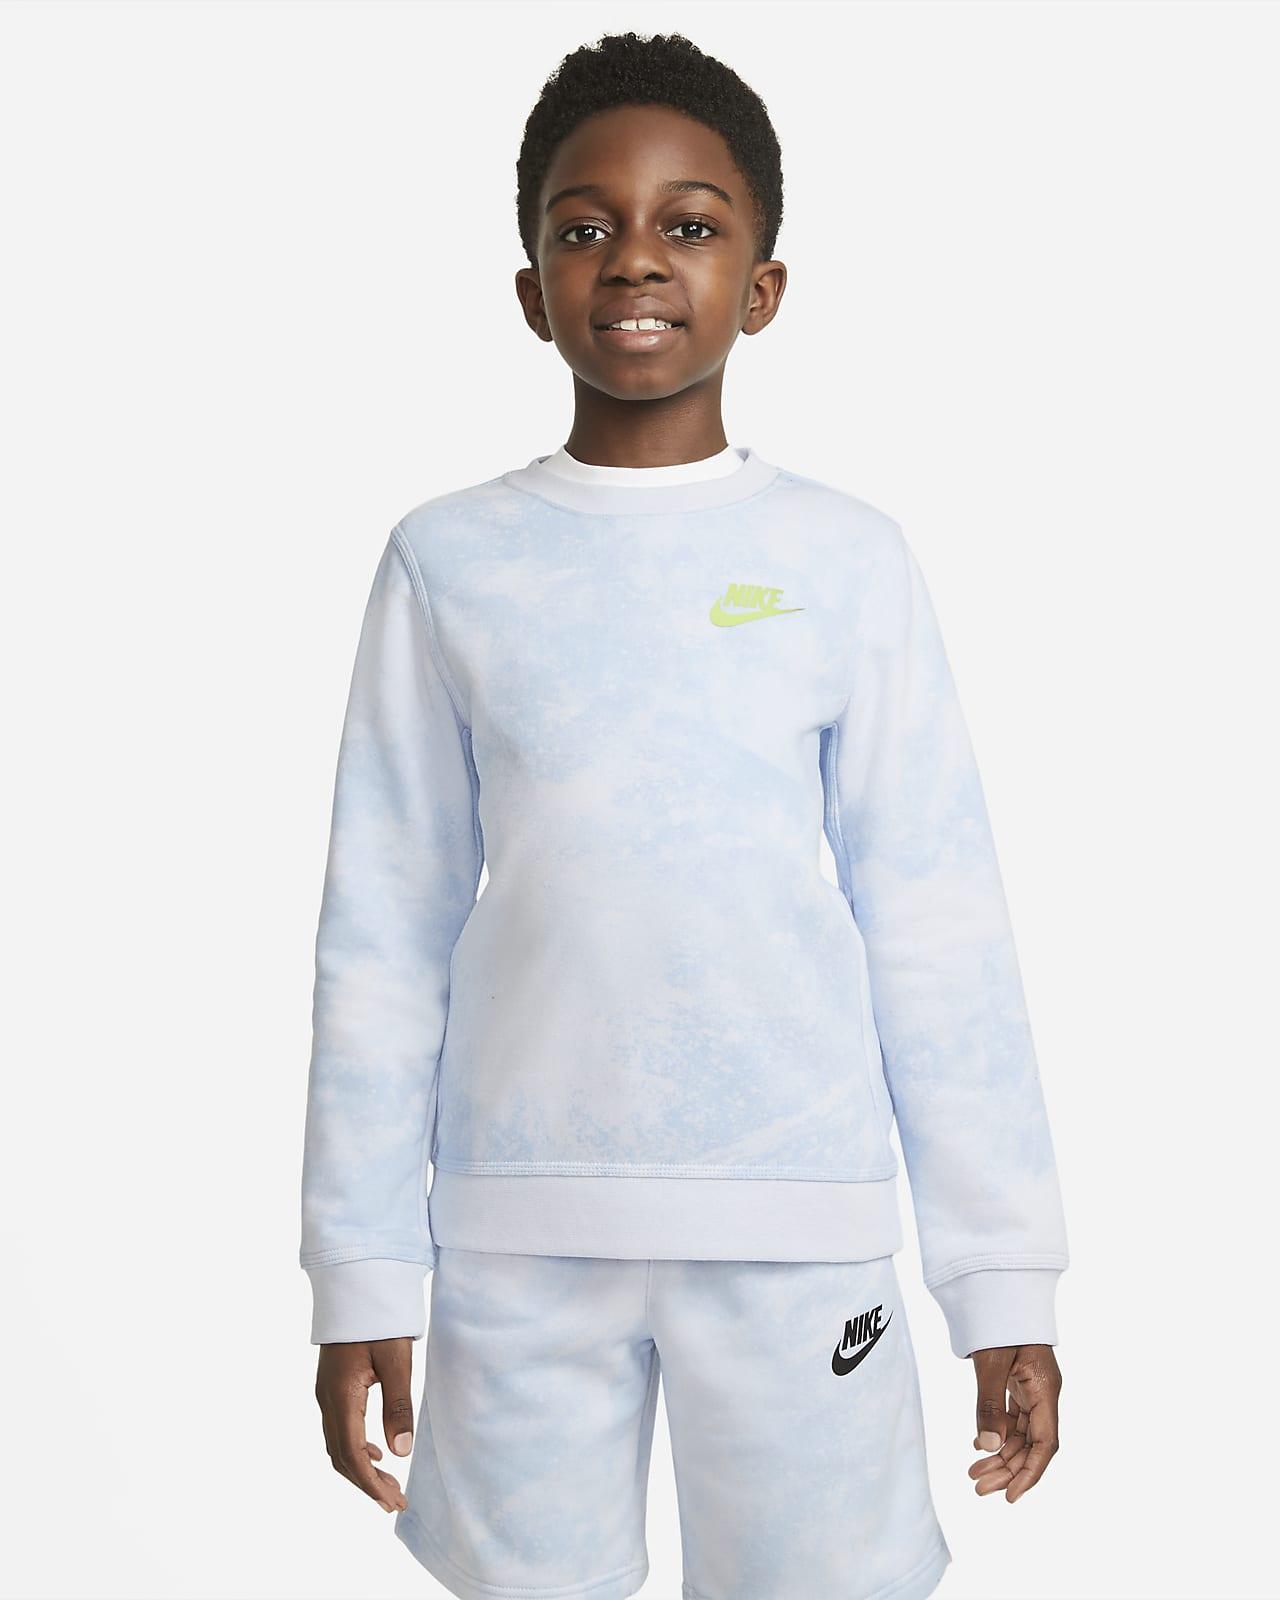 Nike Sportswear Magic Club Batik Boyalı Genç Çocuk (Erkek) Crew Üst